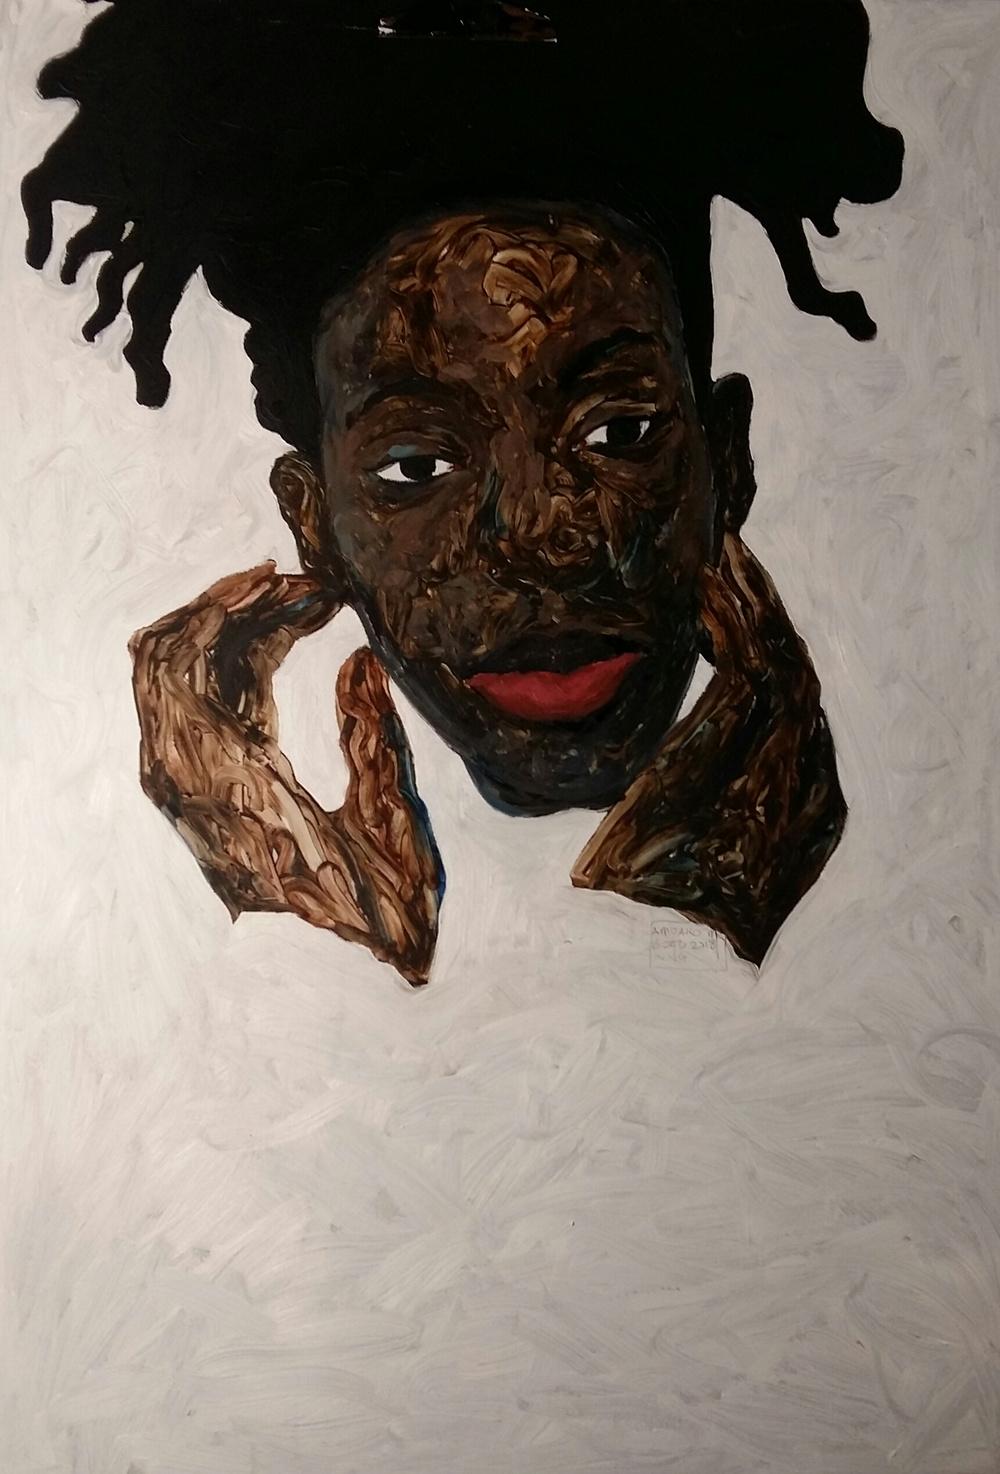 影戰士 by Tina Yeh in 2020 Black girl art, Black art